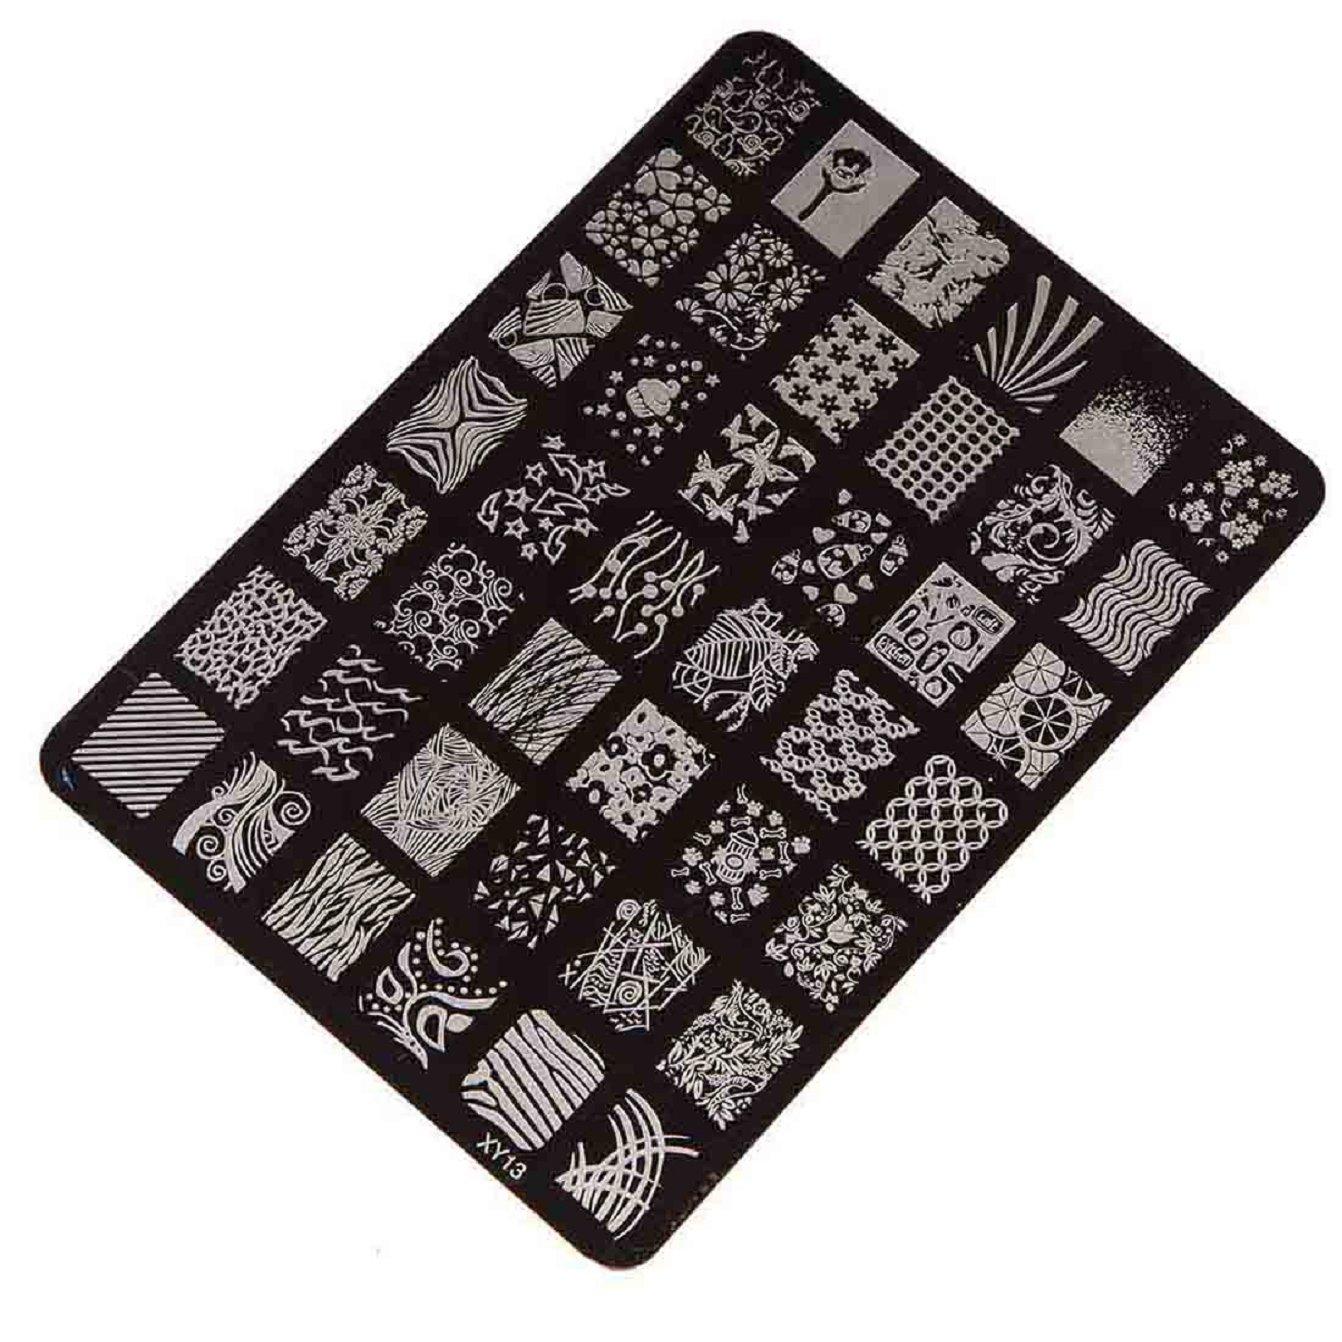 Amazon.com : Sannysis Nail Stamping Printing Plate Manicure Nail Art ...